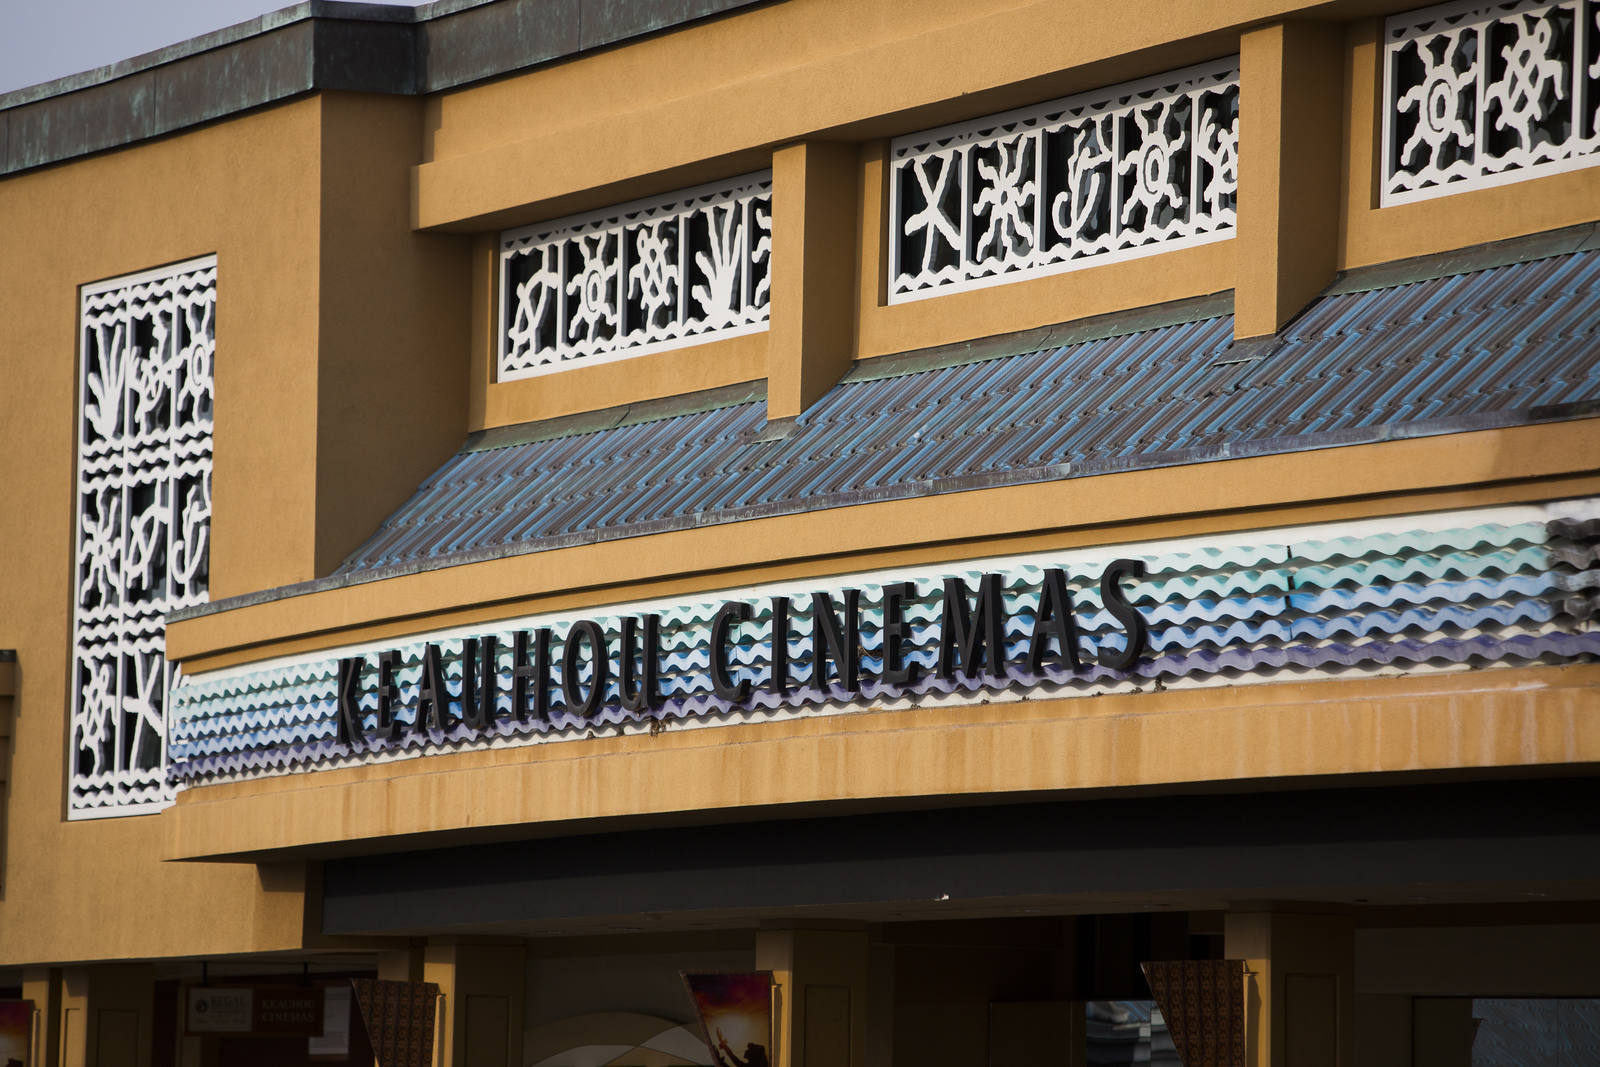 Keauhou Shopping Center - Kailua-Kona, HI